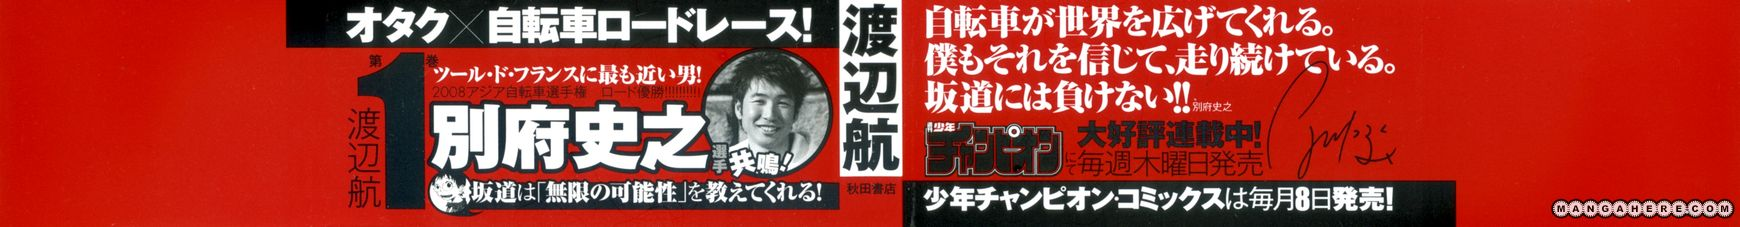 Yowamushi Pedal 1 Page 2